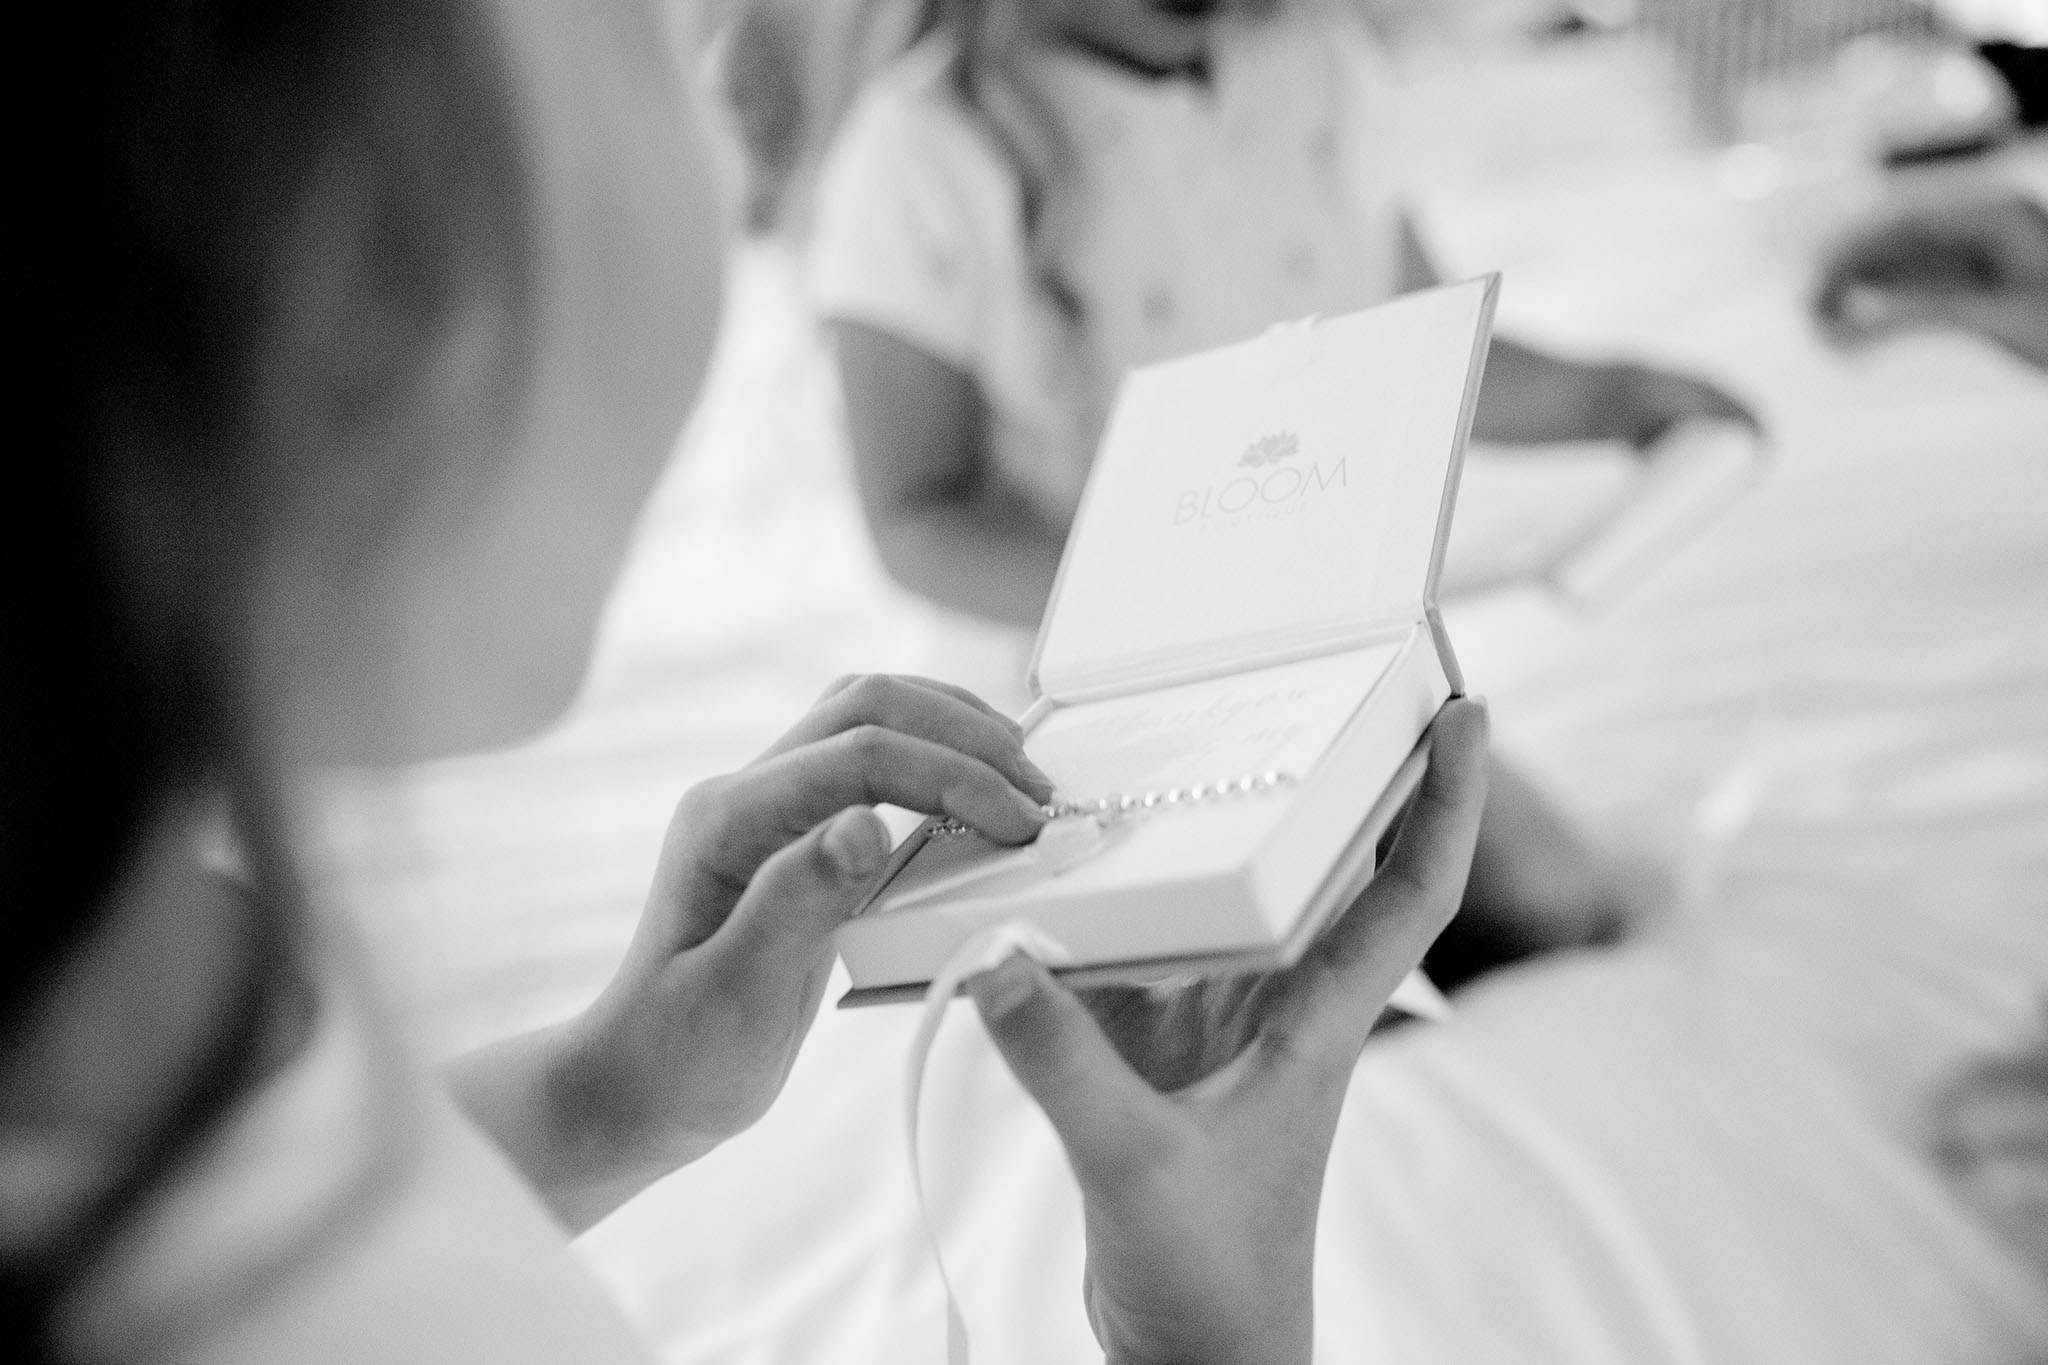 elizabethg_photography_hertfordshire_fineart_photographer_tonycharlie_wedding_photography_aldermaston_wasing_park_reading_20.jpg